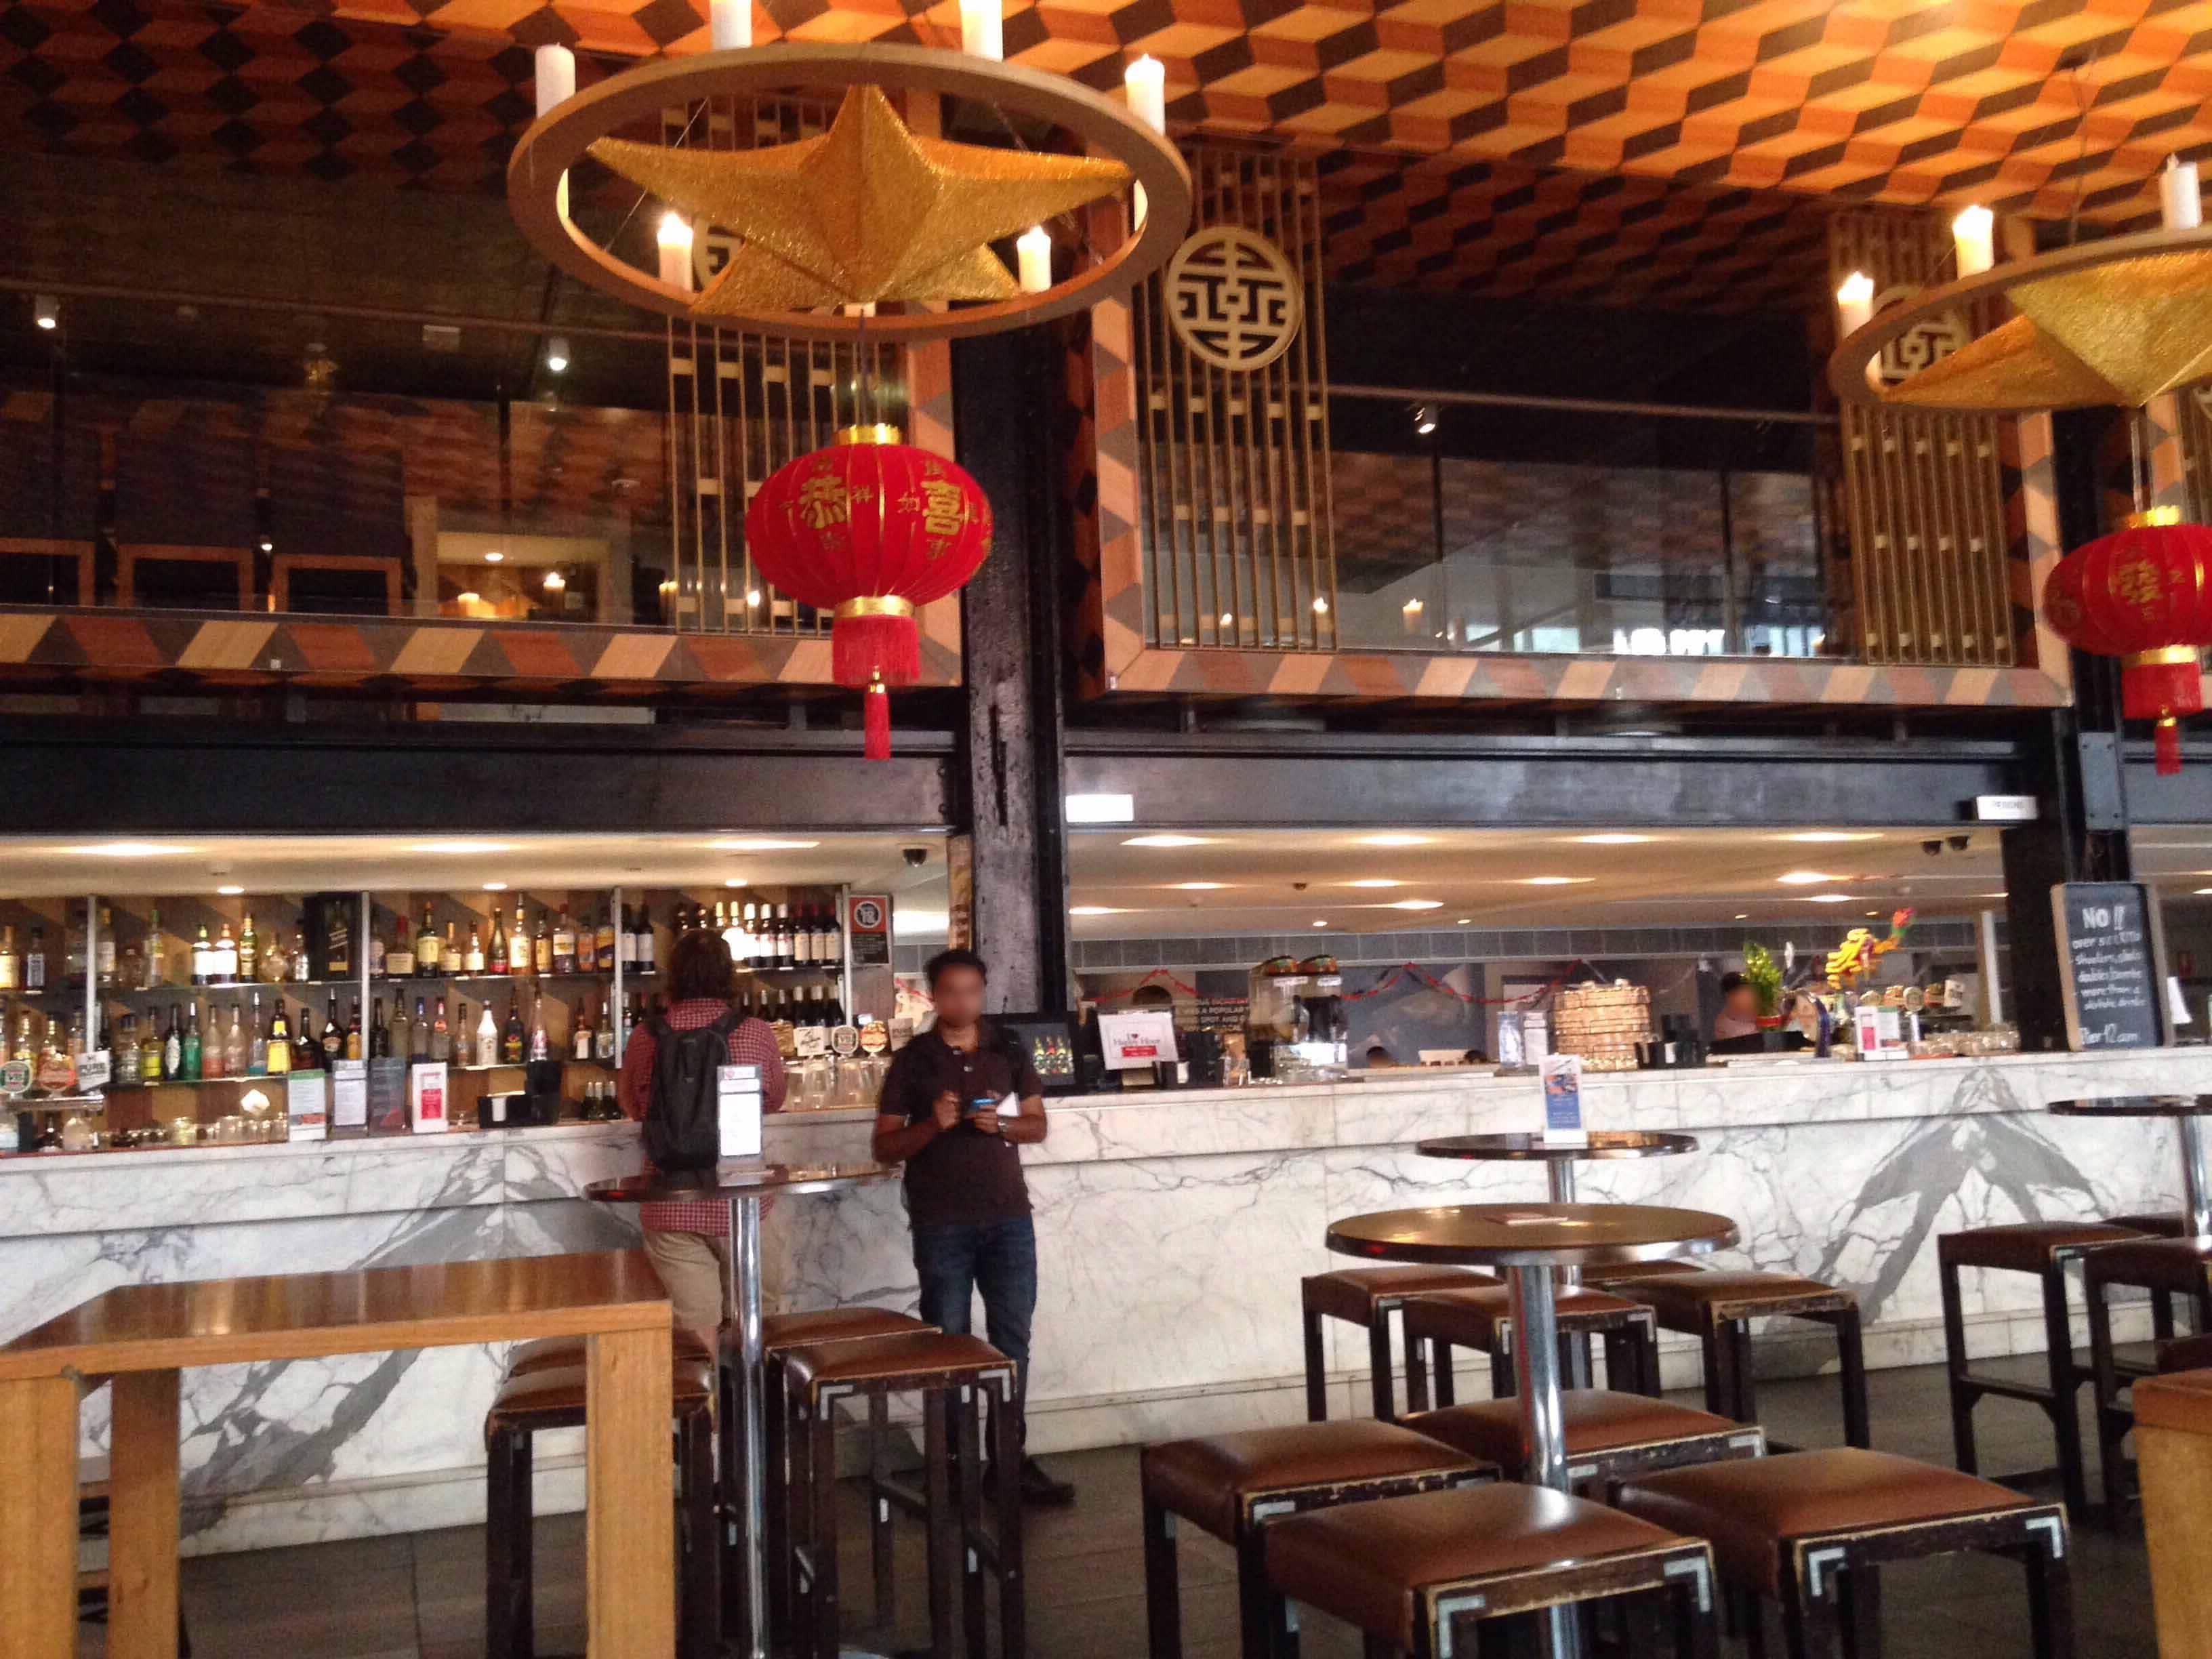 MON Modern Thai & Cocktails - Mr Bs Hotel | 396 Pitt Street, Sydney, New South Wales 2000 | +61 2 8080 7777